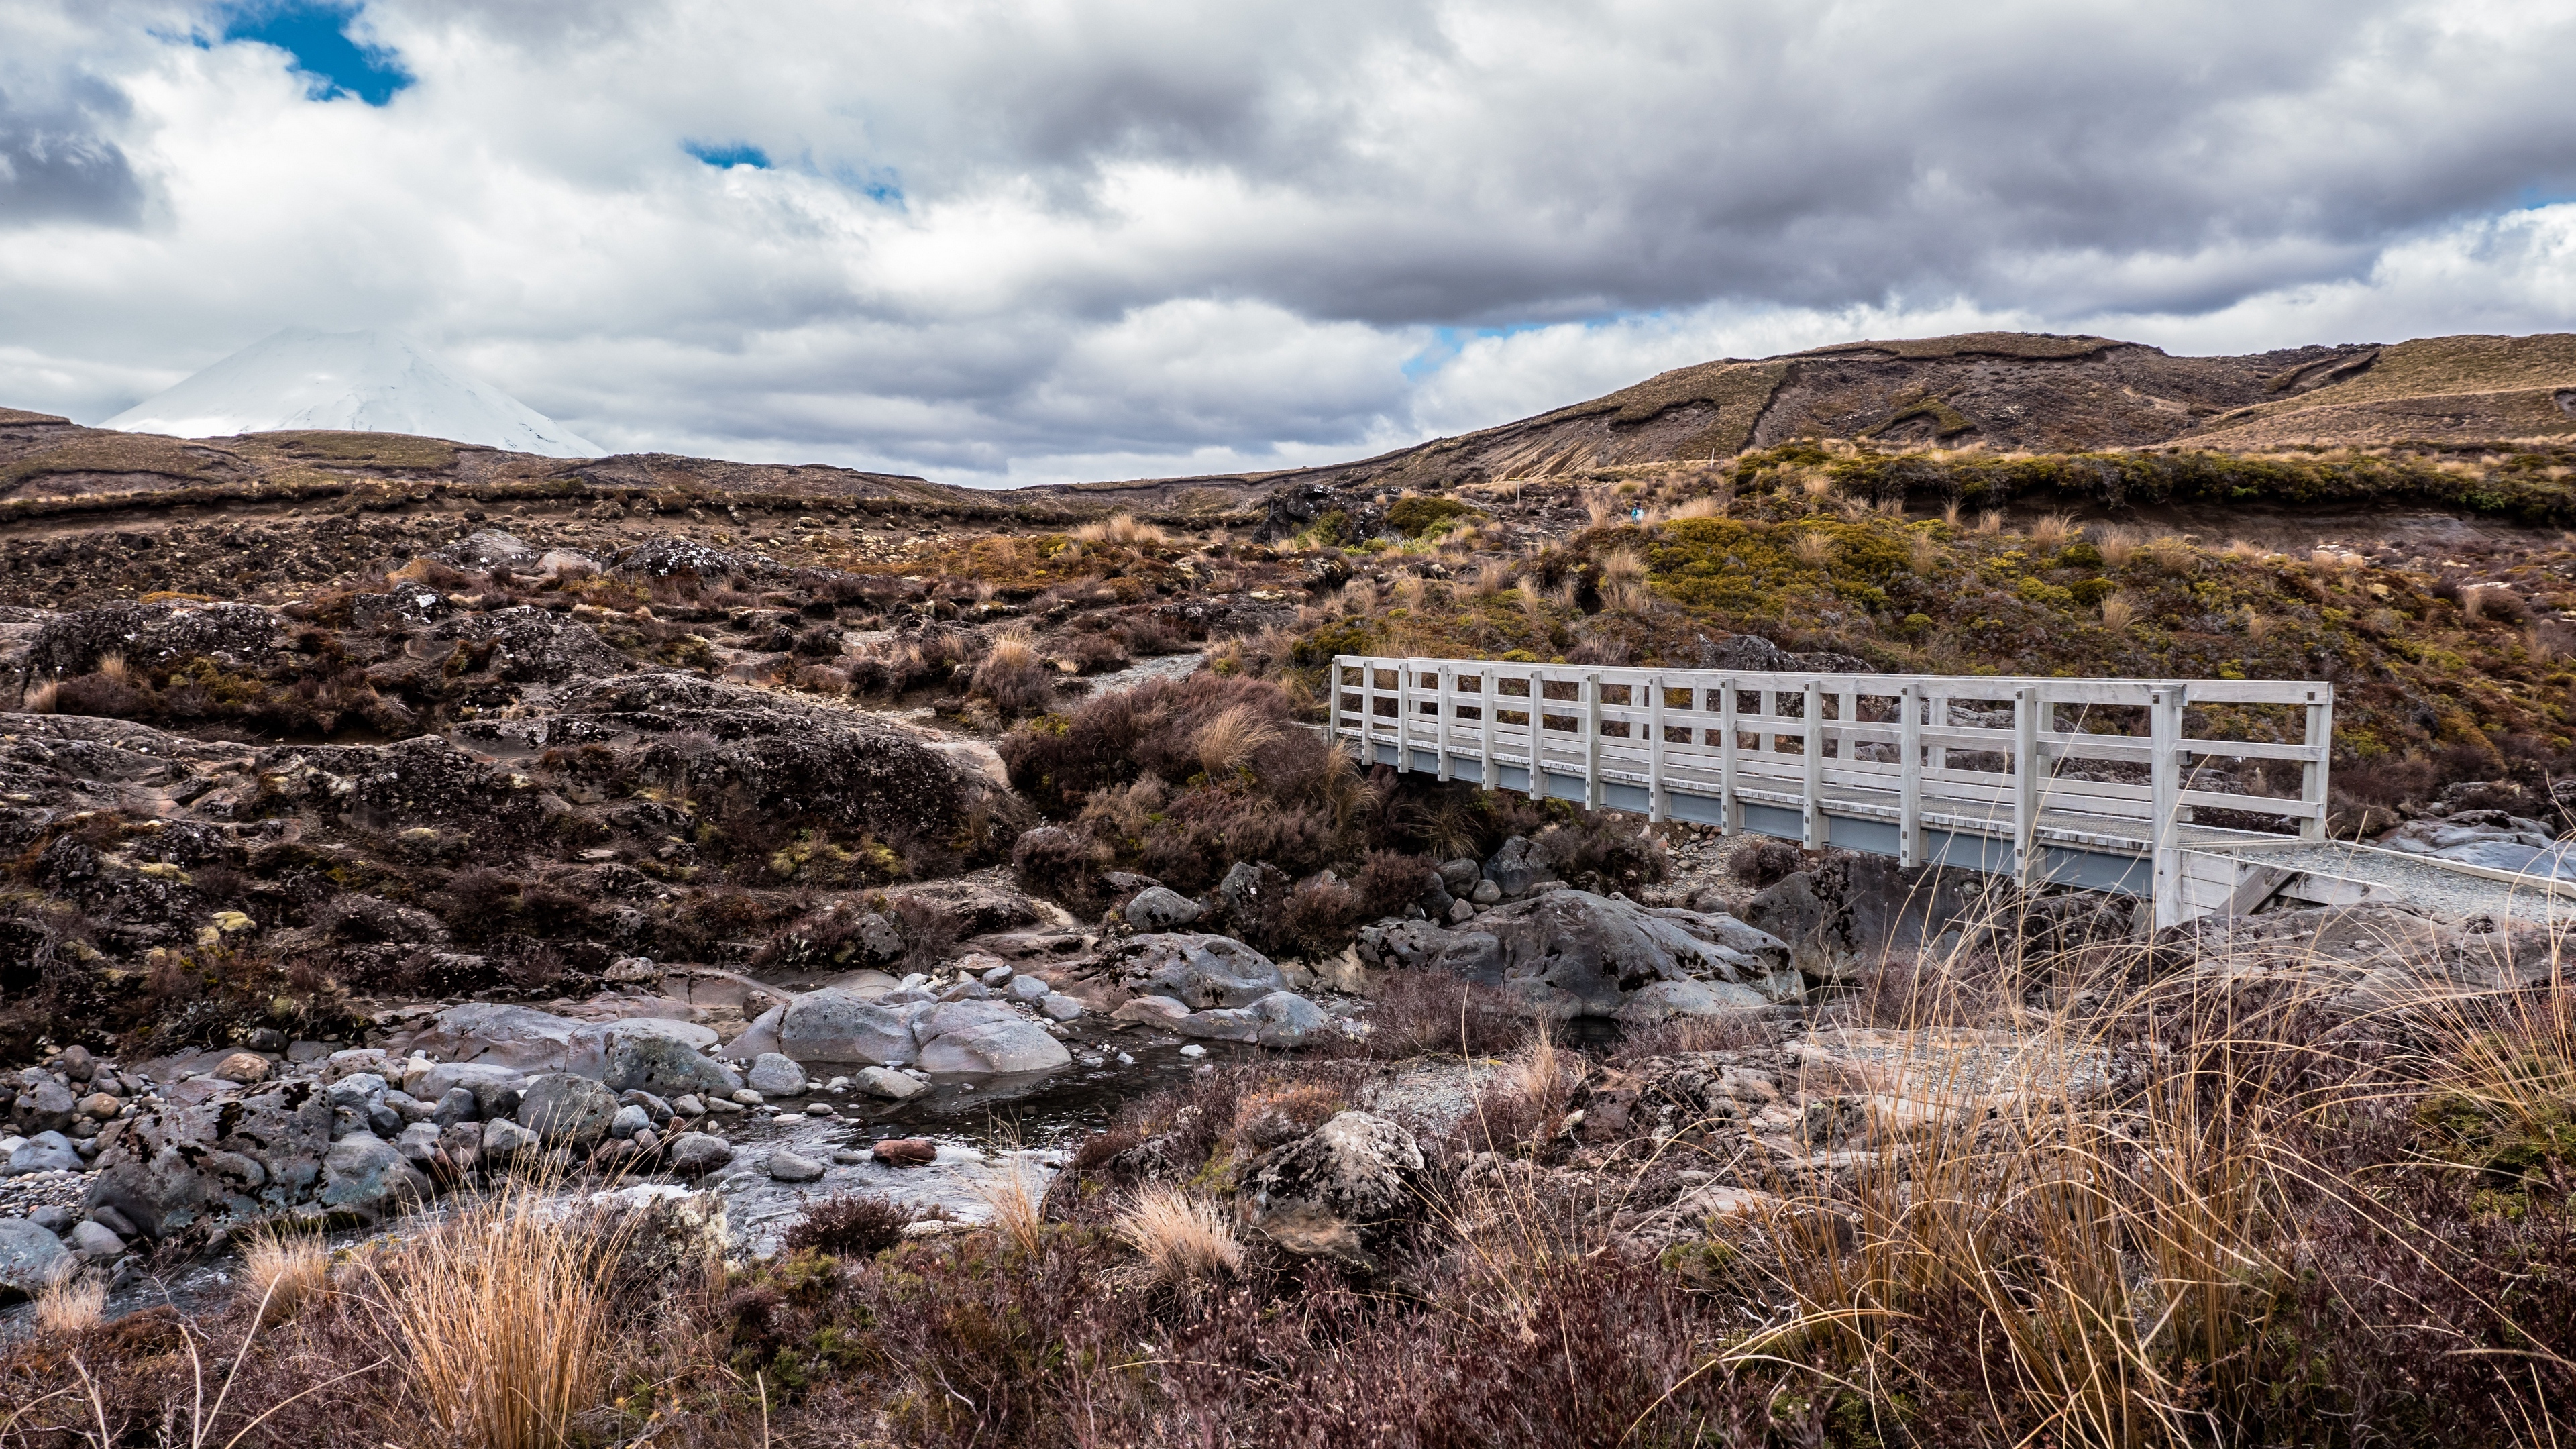 bridge river rocks 4k 1541116160 - bridge, river, rocks 4k - Rocks, River, bridge